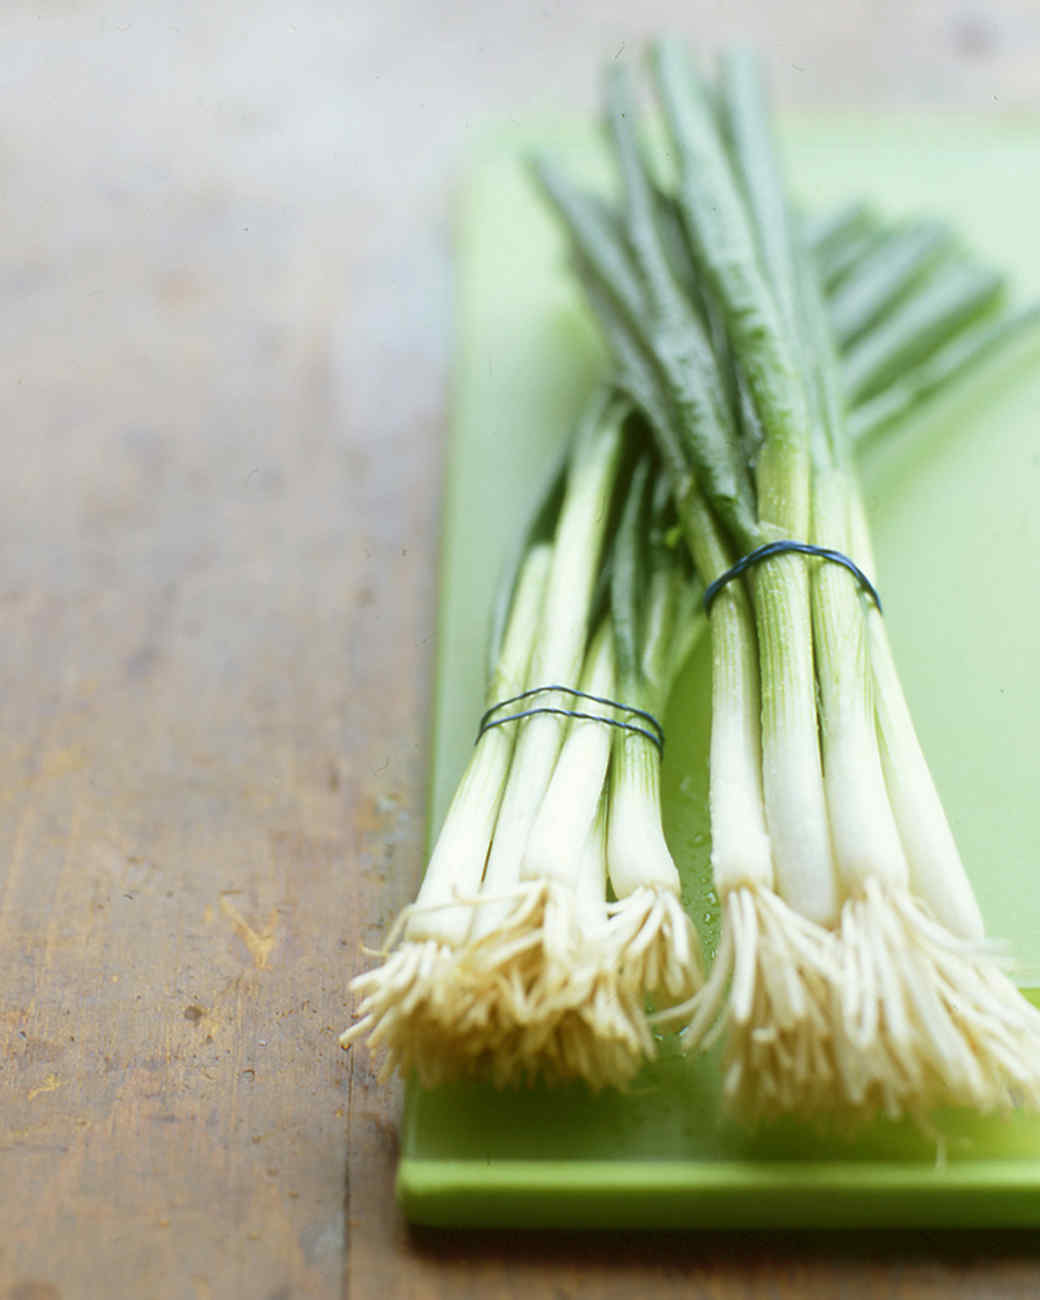 Ramp Scallion And Spring Onion Recipes Martha Stewart